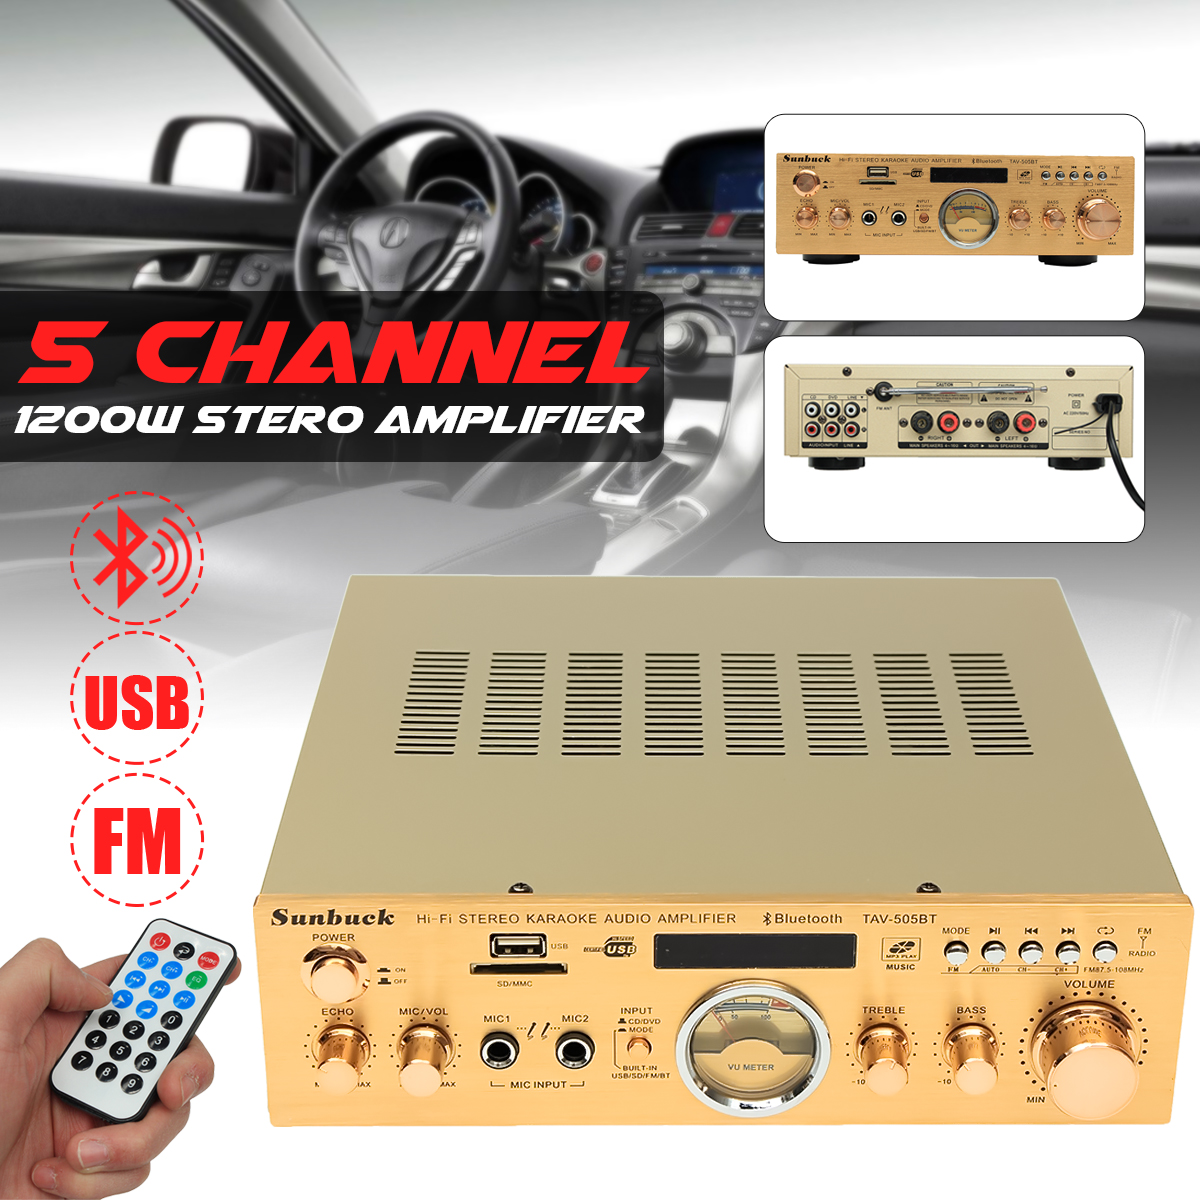 Sunbuck TAV-505BT 400W+400W HiFi Bluetooth Power VU Meter Amplifier Stereo Karaoke FM USB SD 100x car dome light 18 smd 5630 18smd 5730 led car interior roof panel reading auto with t10 ba9s festoon 2 adapters white 12v